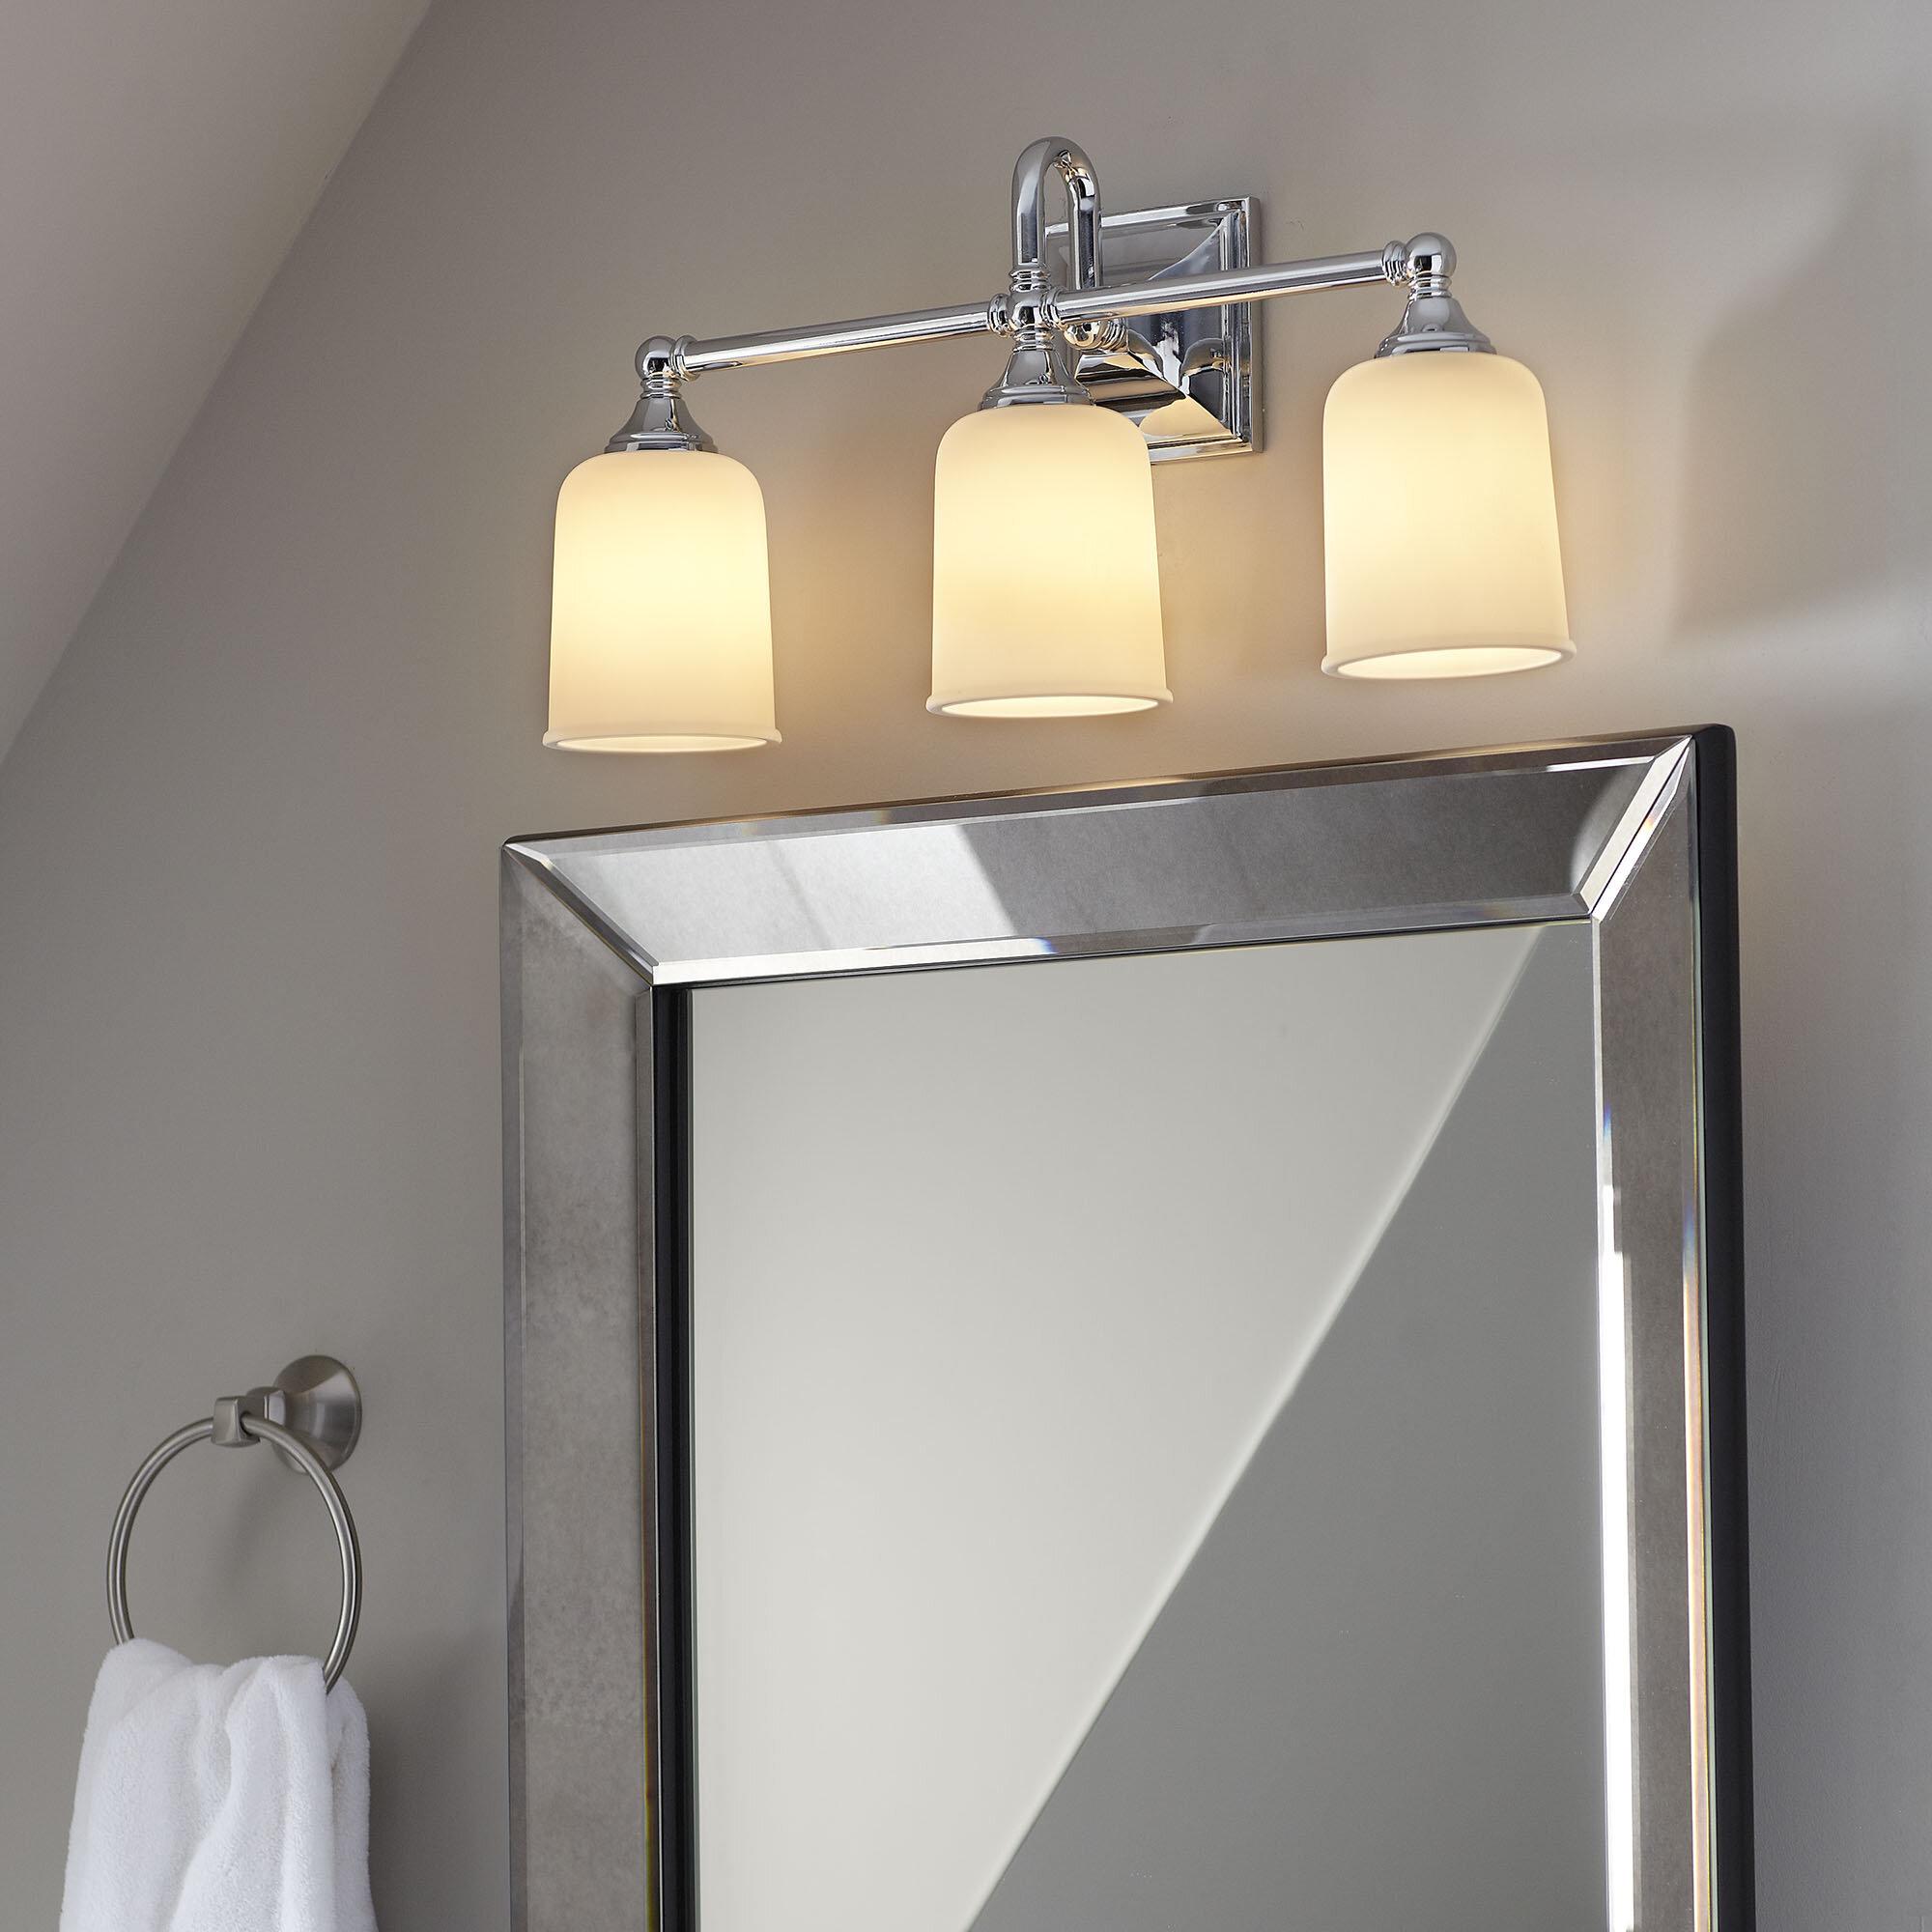 Birch Lane™ Beacon 3-Light Vanity Light & Reviews | Birch Lane